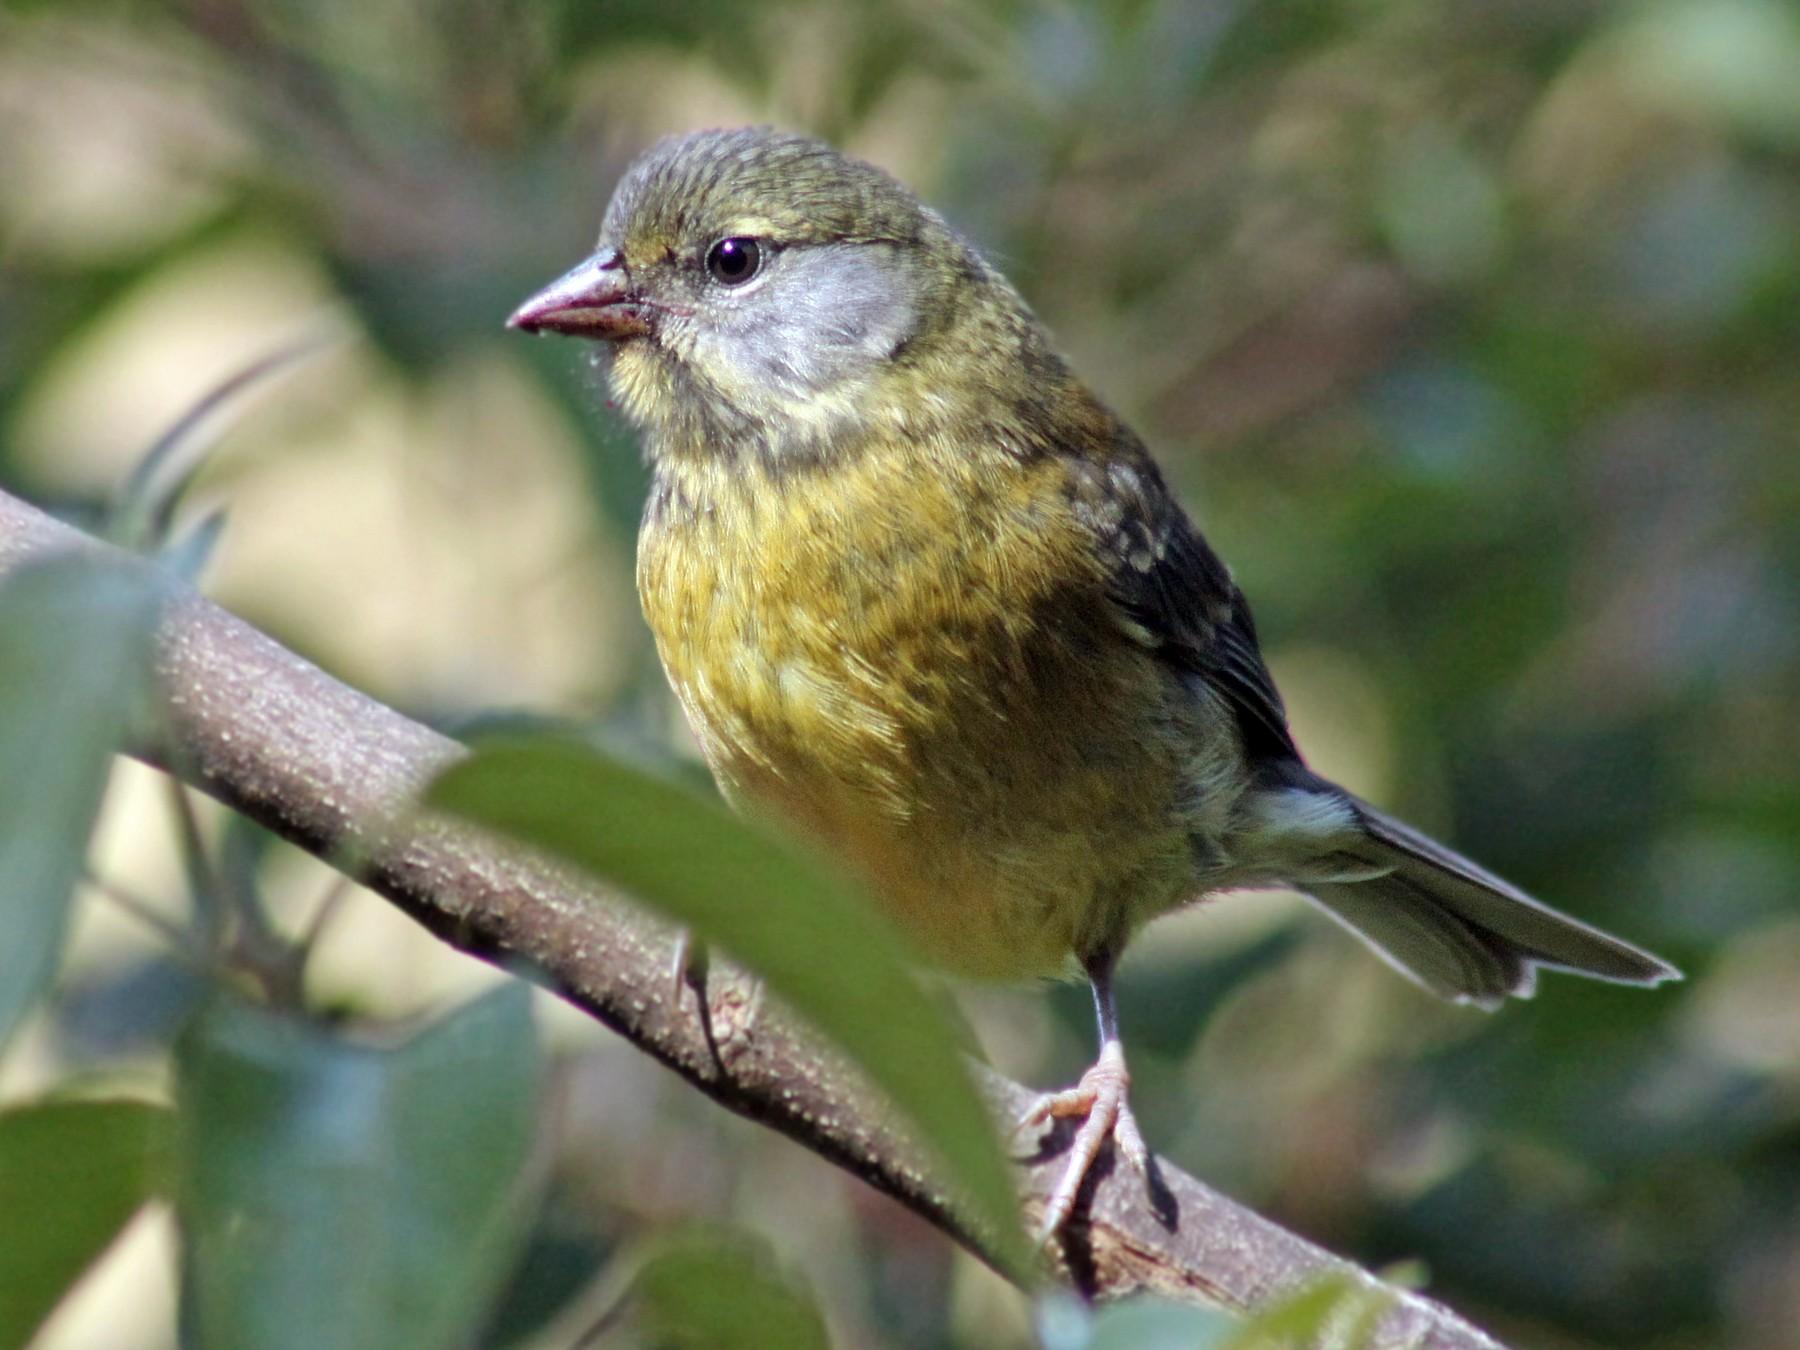 Patagonian Sierra-Finch - Caleb Marshall